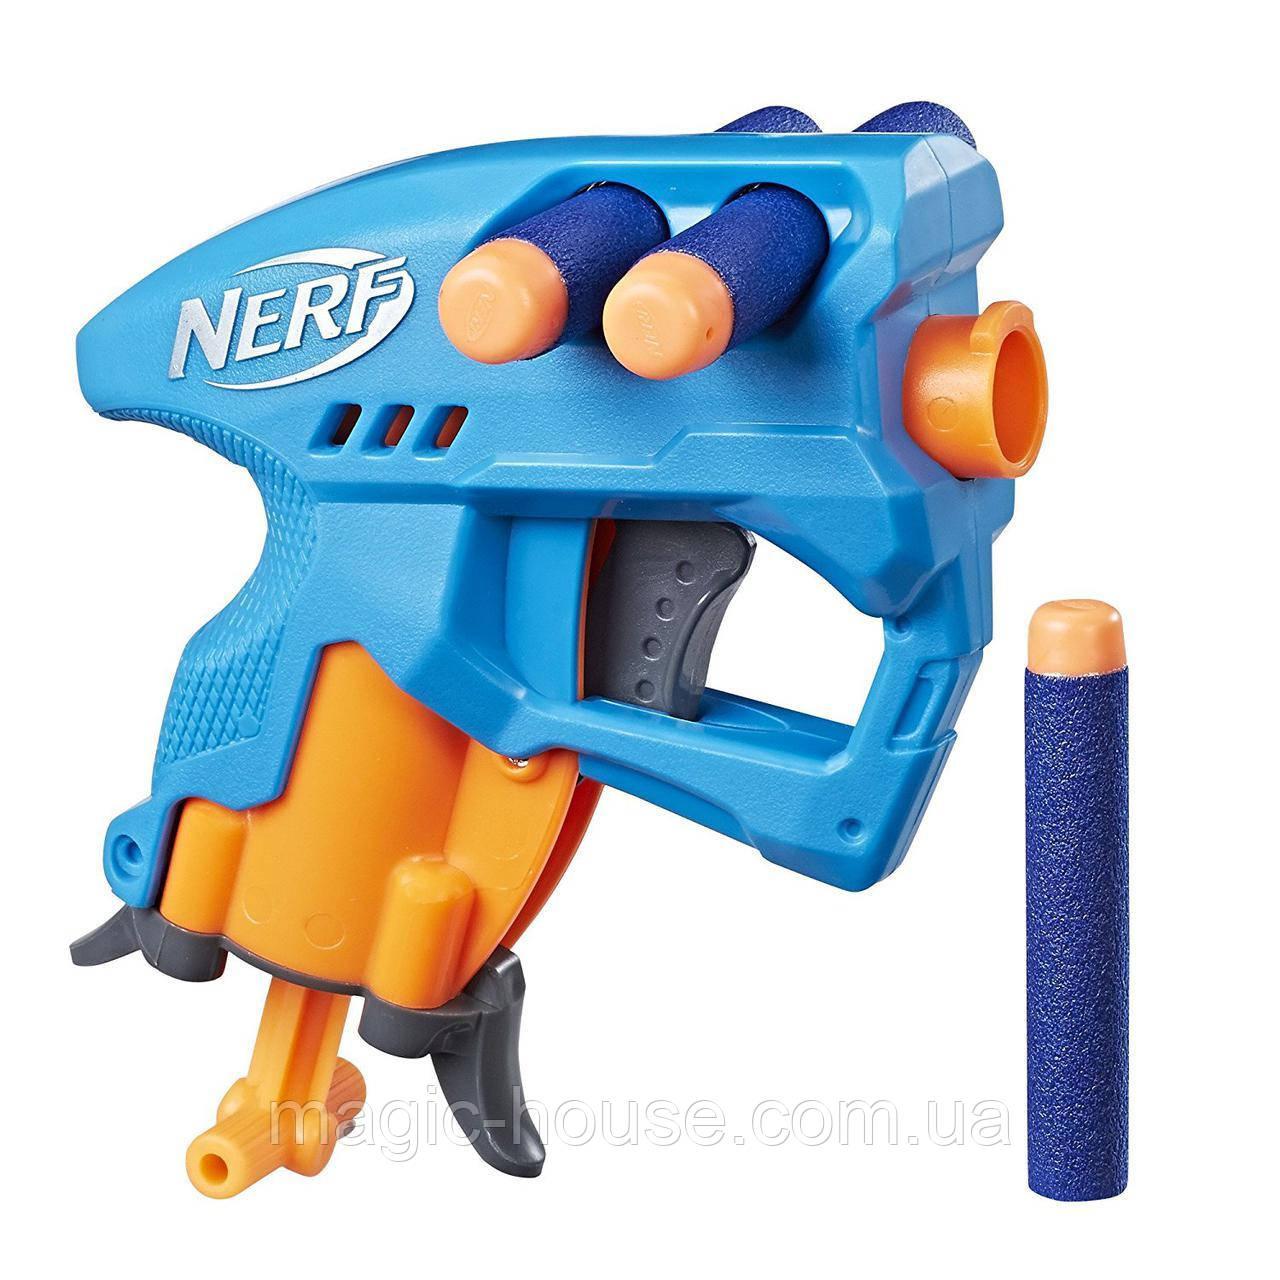 Бластер Нерф Нано Фаер (Голубой) Nerf N-Strike NanoFire (blue)